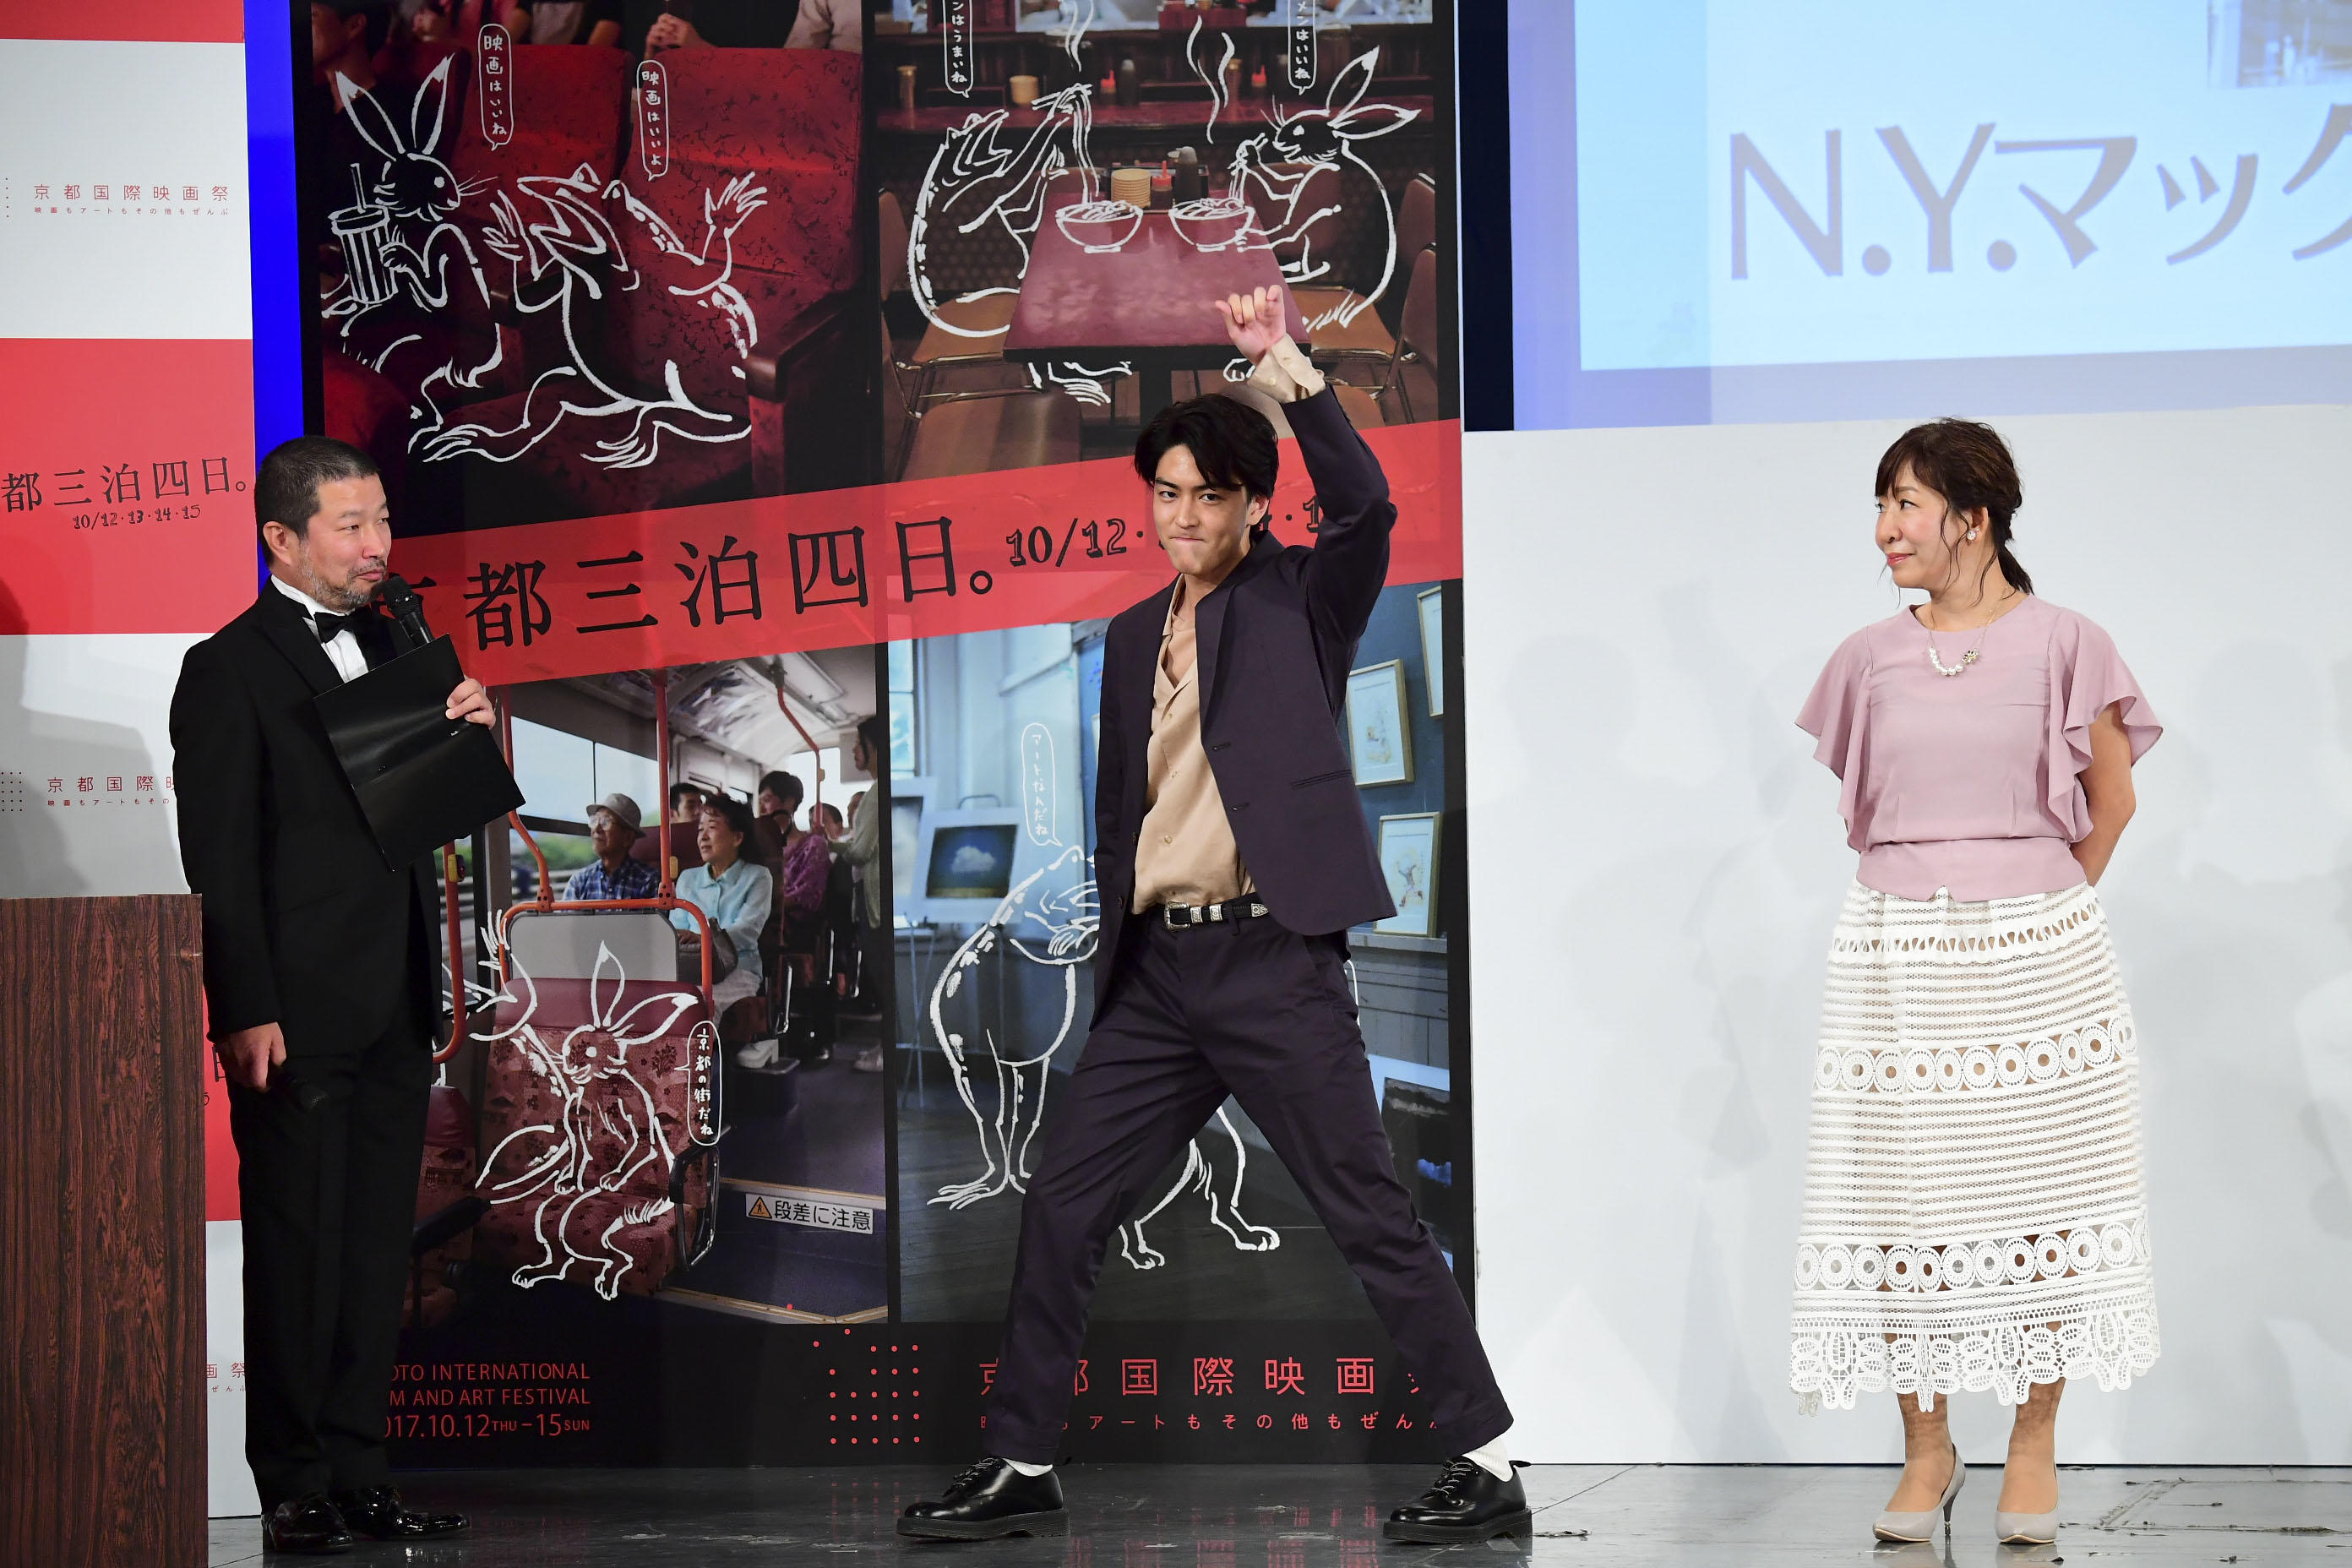 http://news.yoshimoto.co.jp/20170907004426-52d7cfca6ac37c9e1dcda2e3df8c0dd20a2d624a.jpg